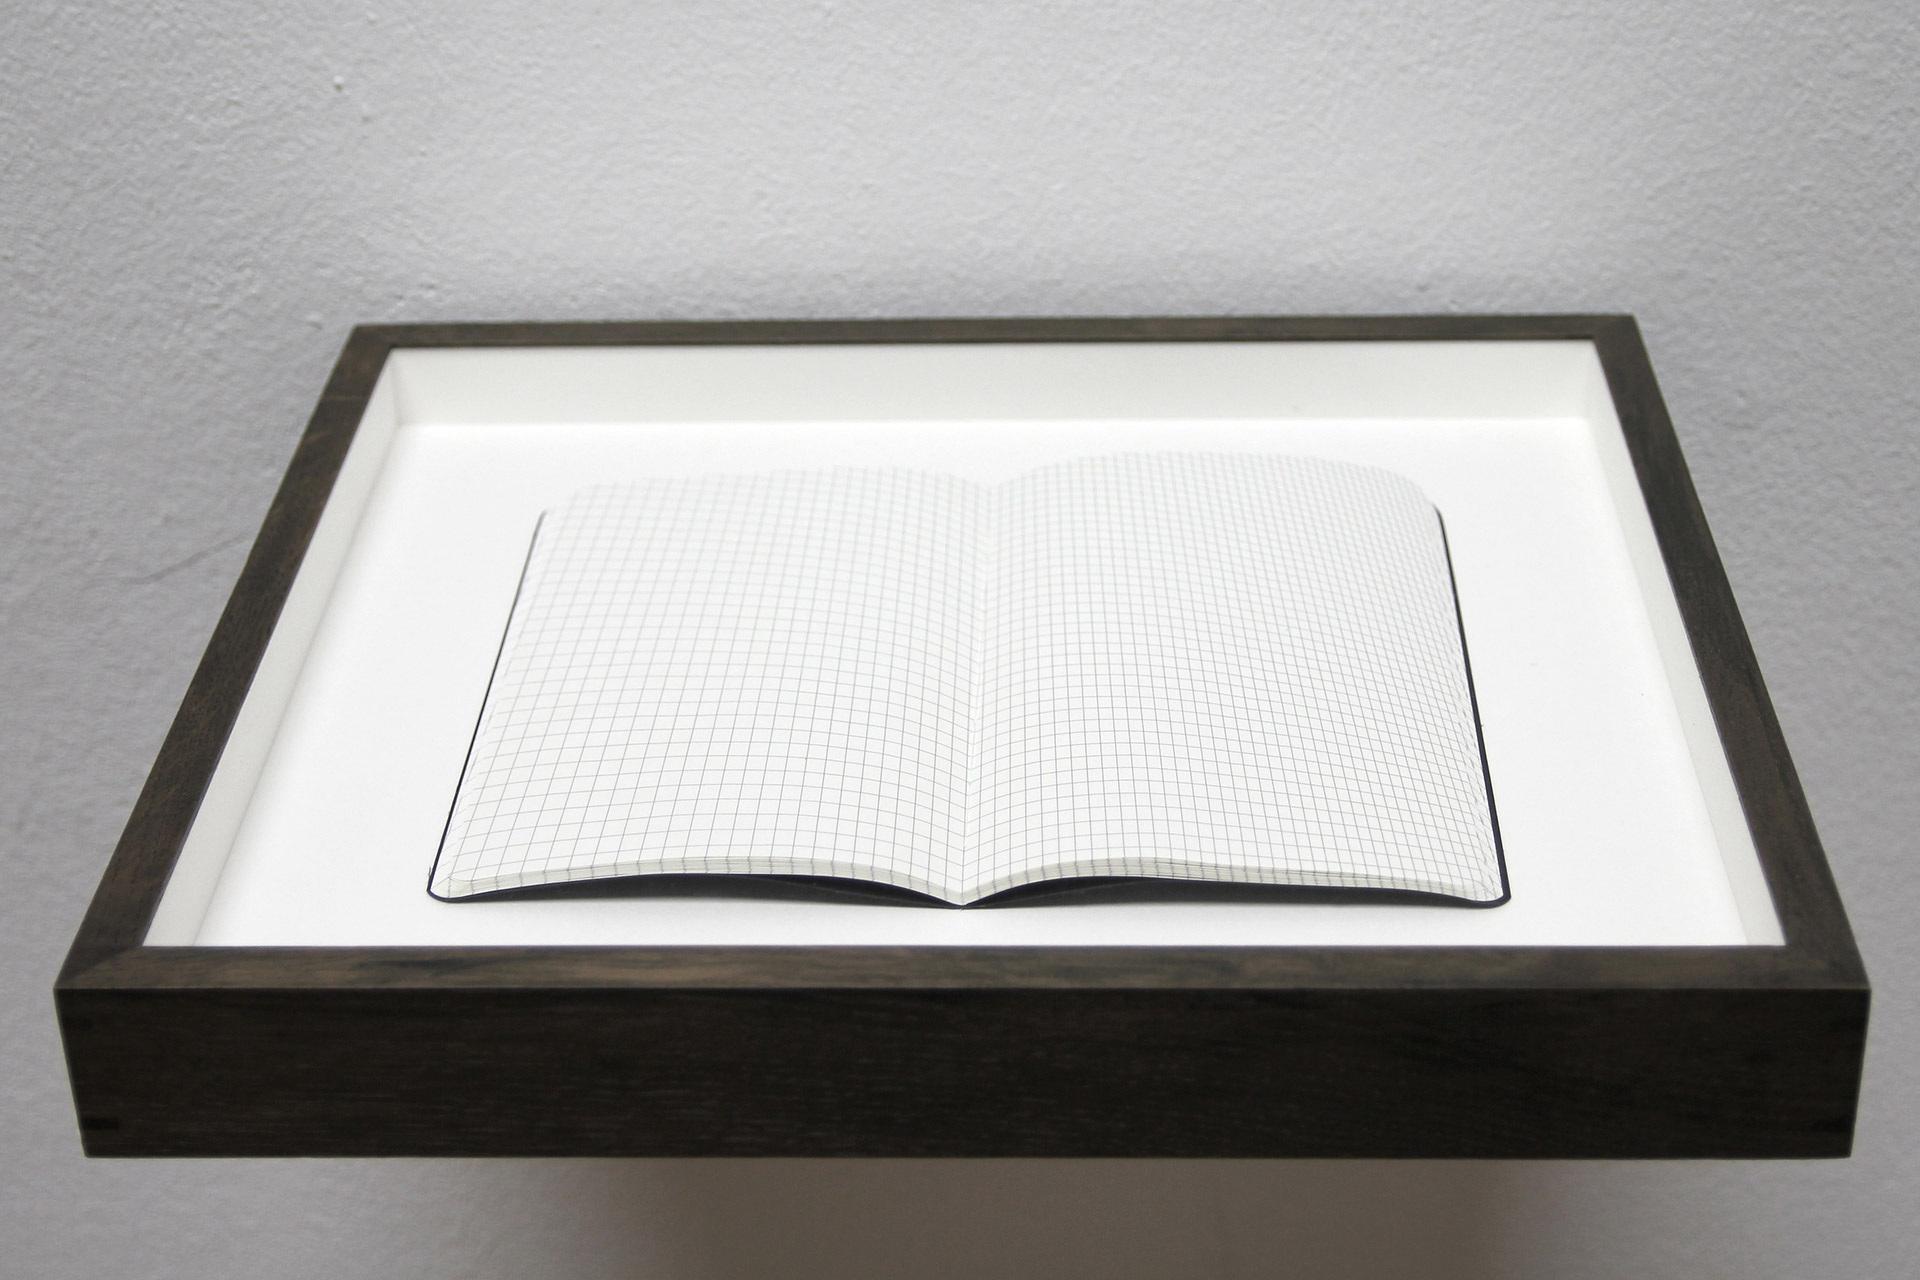 Alexander-Gutke-Kunsthalle-Winterthur-2013-3.jpg